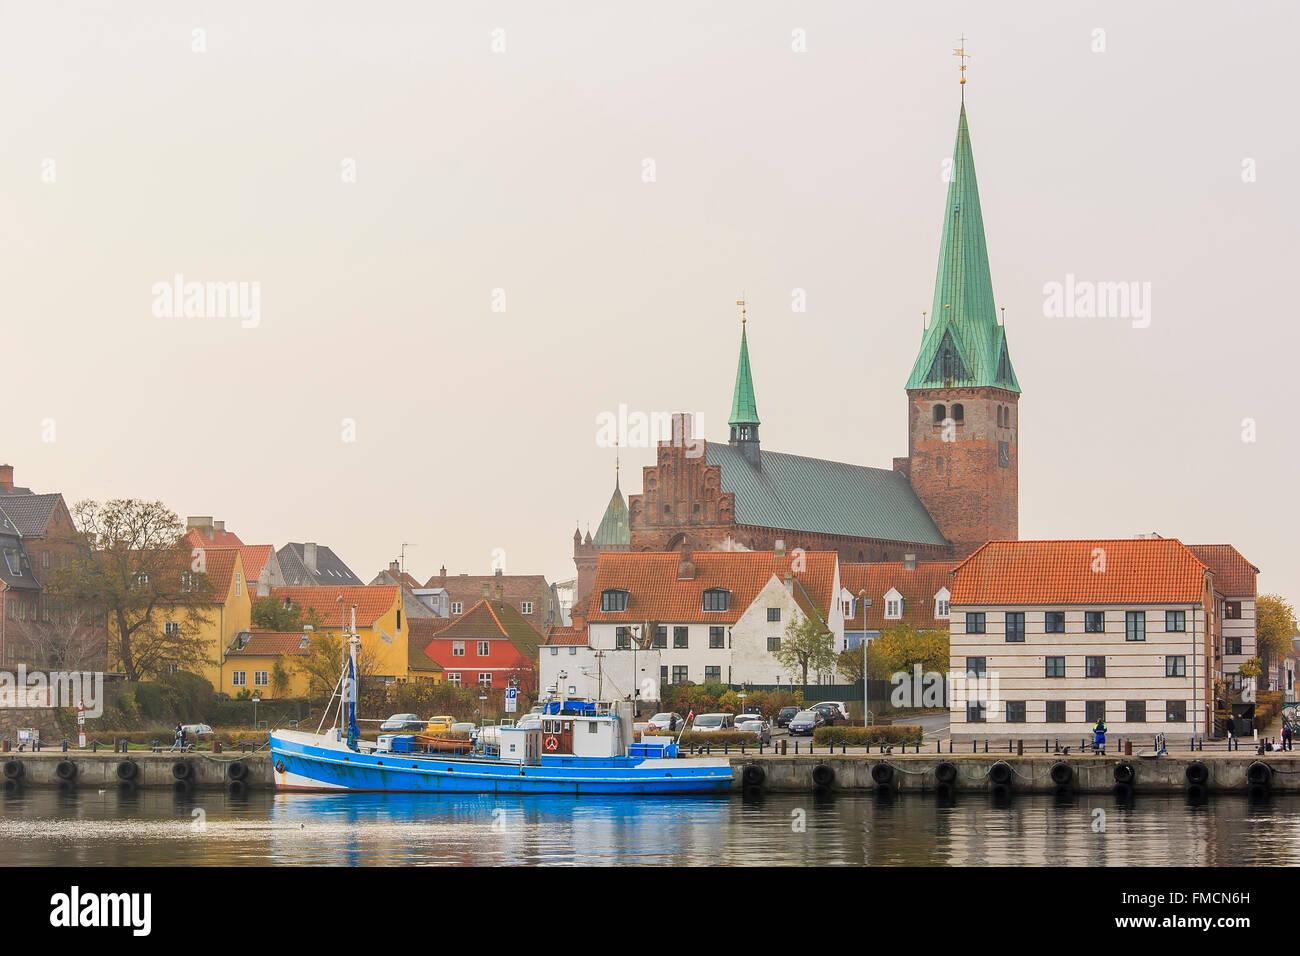 Traveling in the famous Helsingør Domkirke, Copenhagen around Autumn season - Stock Image